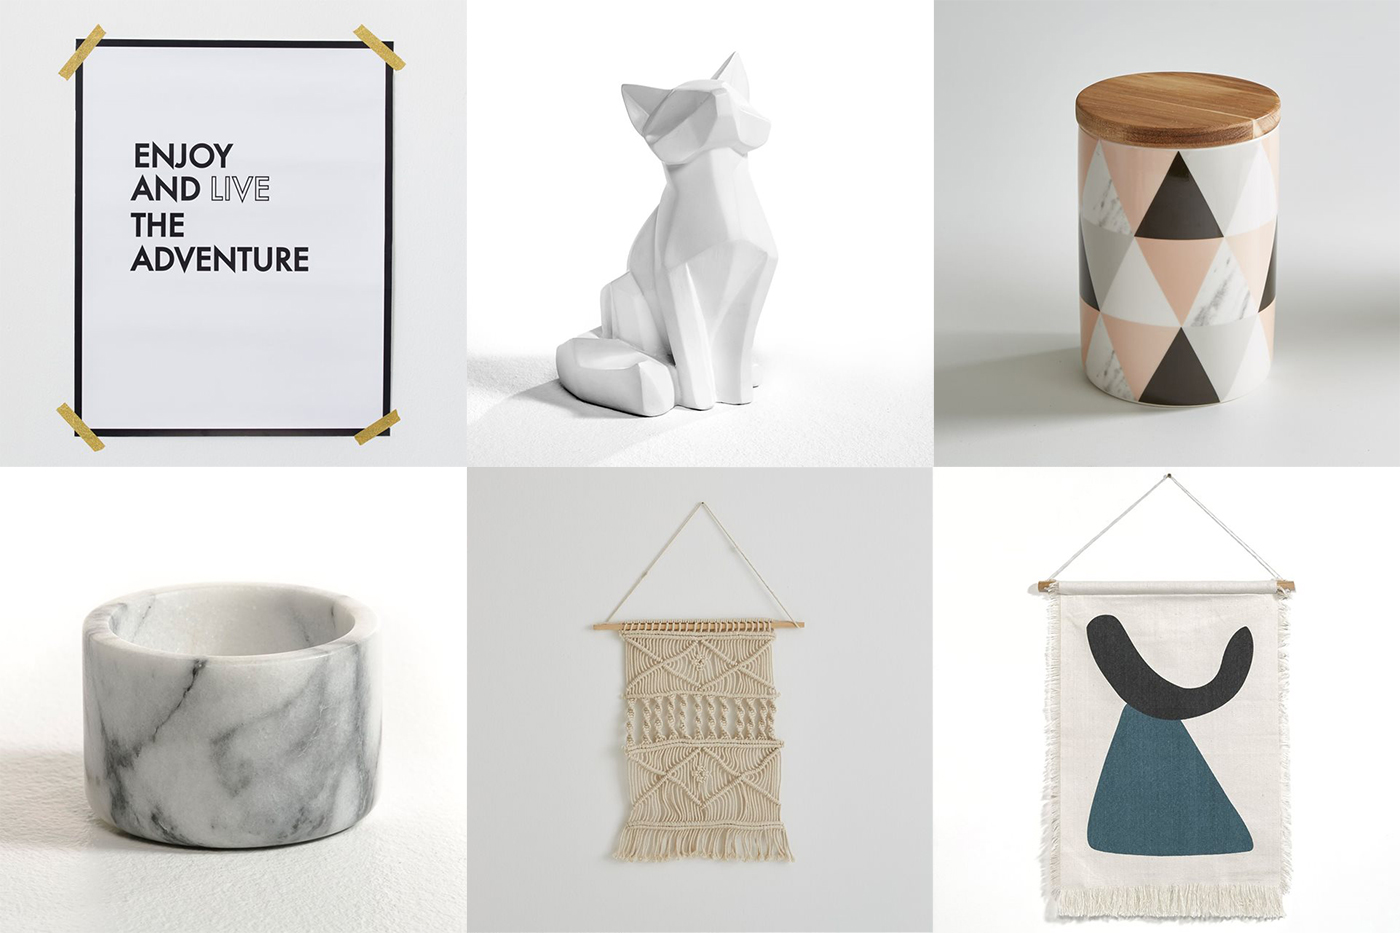 soldes mes coups de coeur d co estelle segura blog. Black Bedroom Furniture Sets. Home Design Ideas